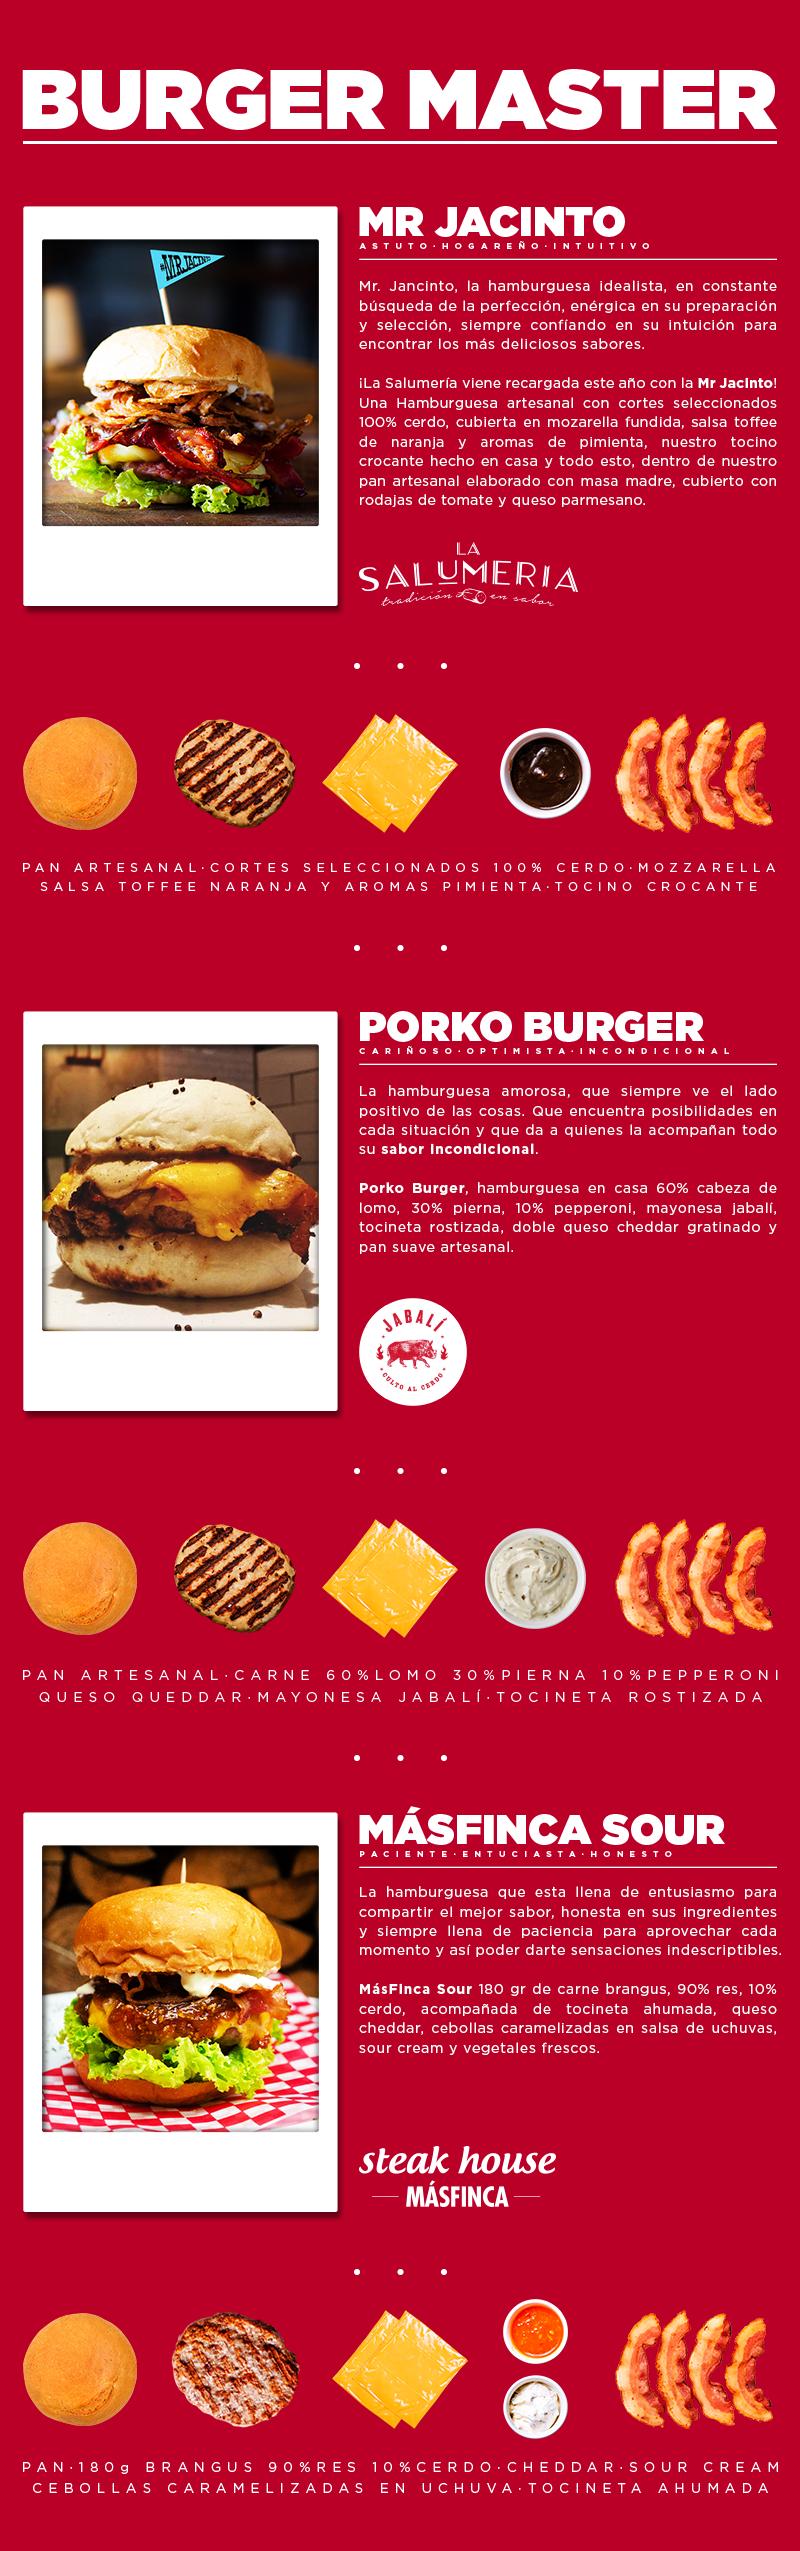 Burger Master - Palmas